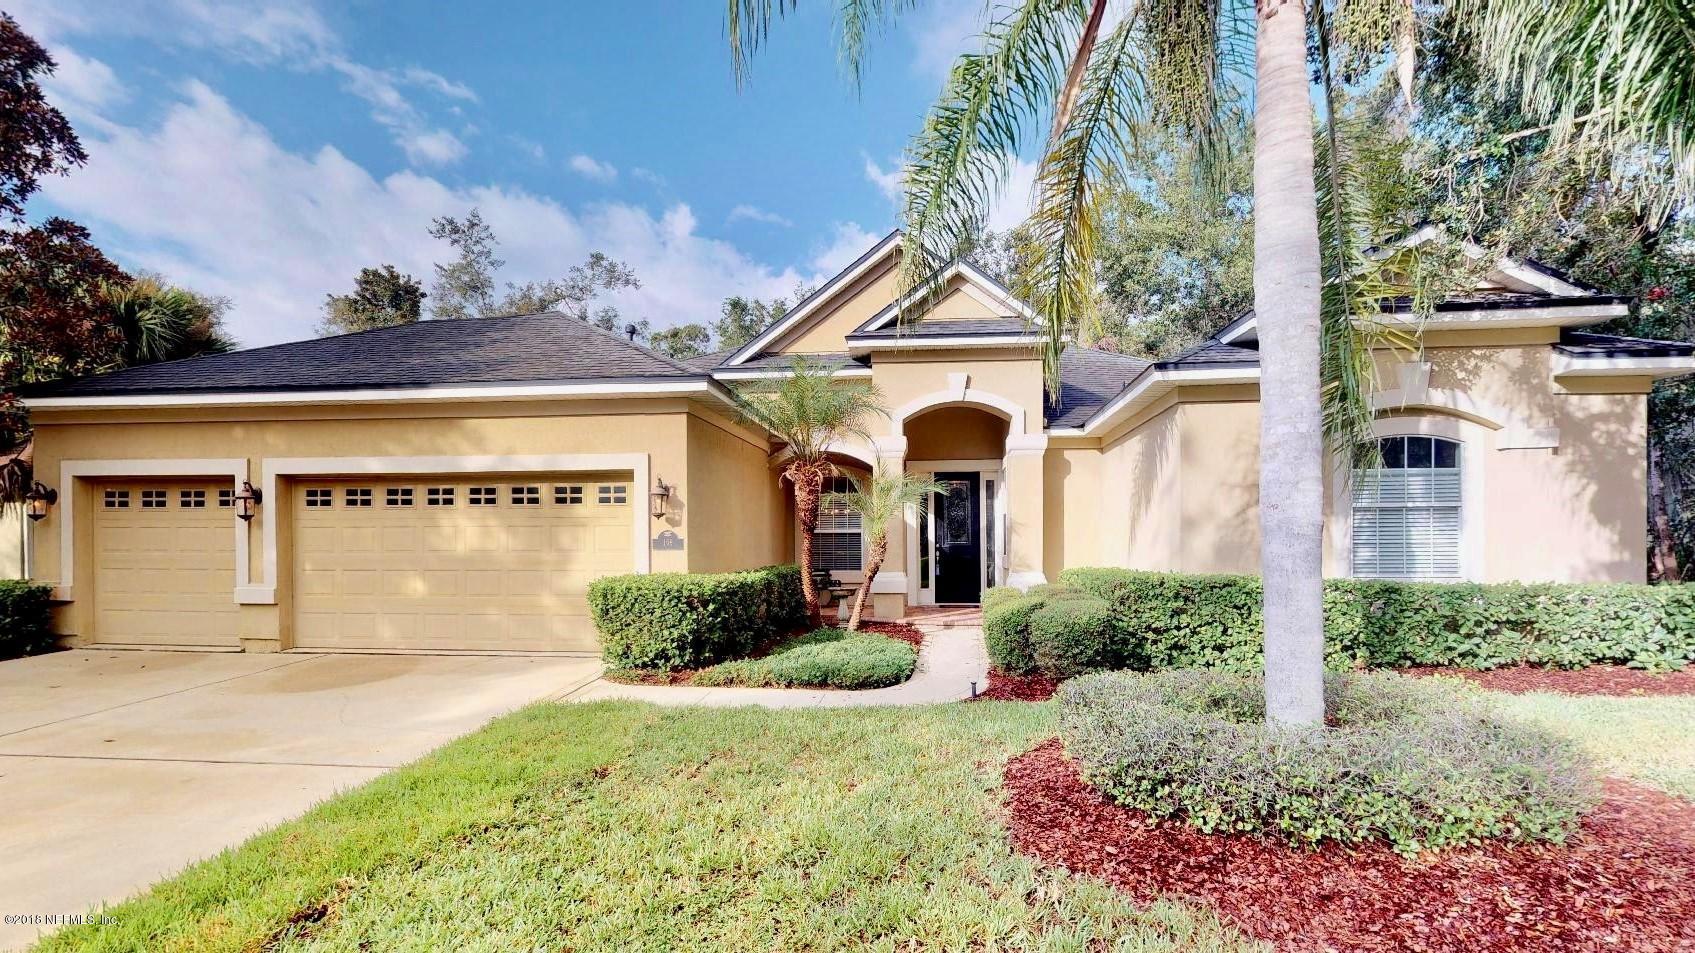 169 PARKSIDE, ST AUGUSTINE, FLORIDA 32095, 4 Bedrooms Bedrooms, ,3 BathroomsBathrooms,Residential - single family,For sale,PARKSIDE,959282